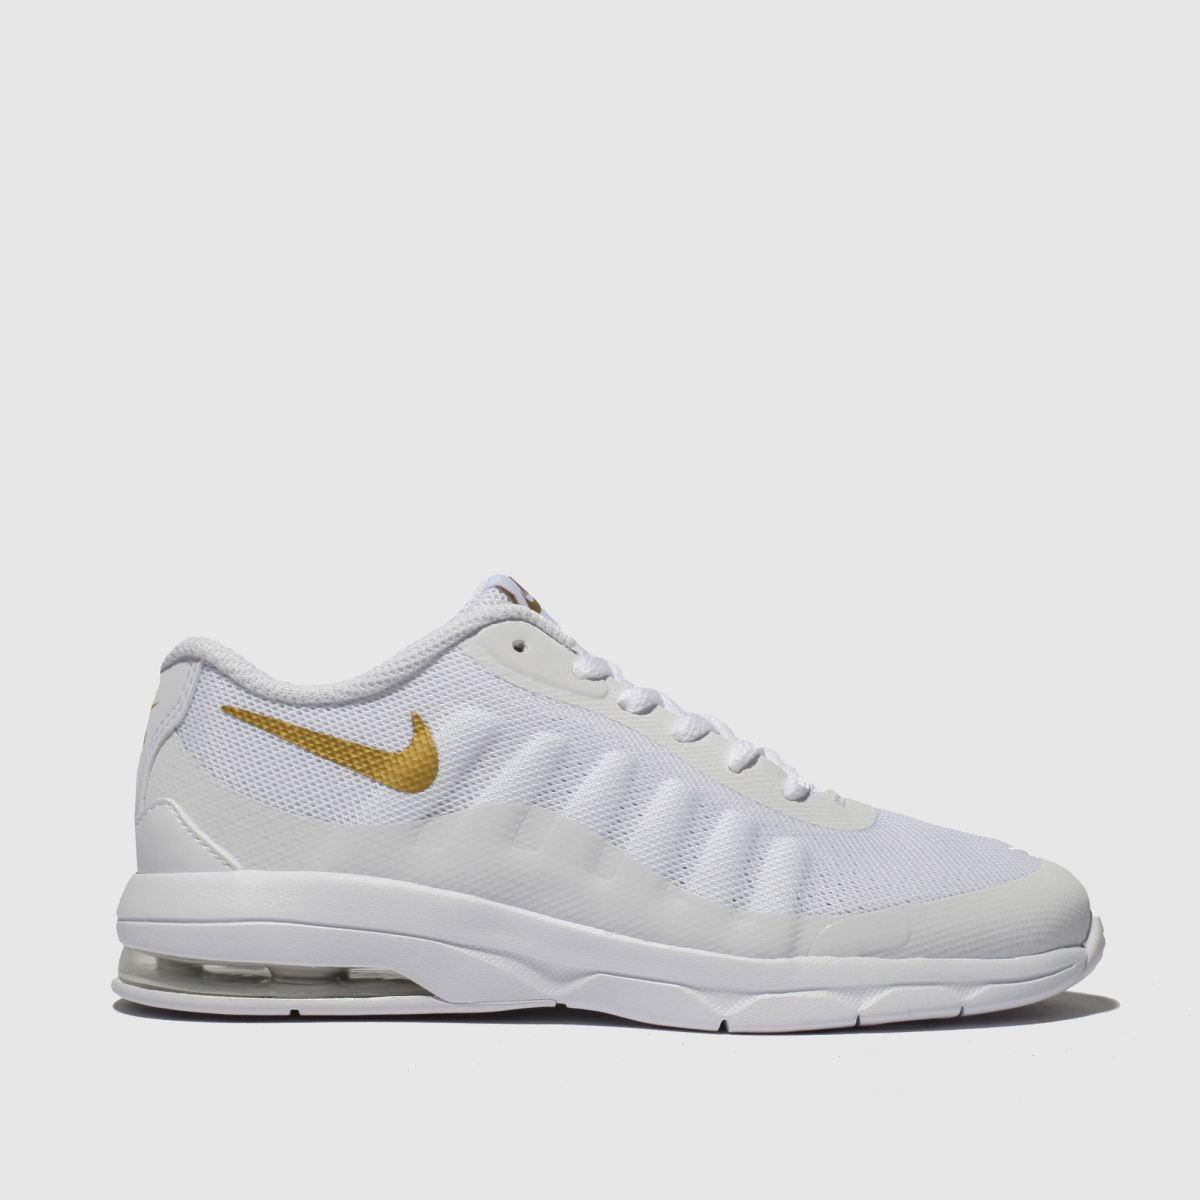 Nike White & Gold Air Max Invigor Trainers Junior